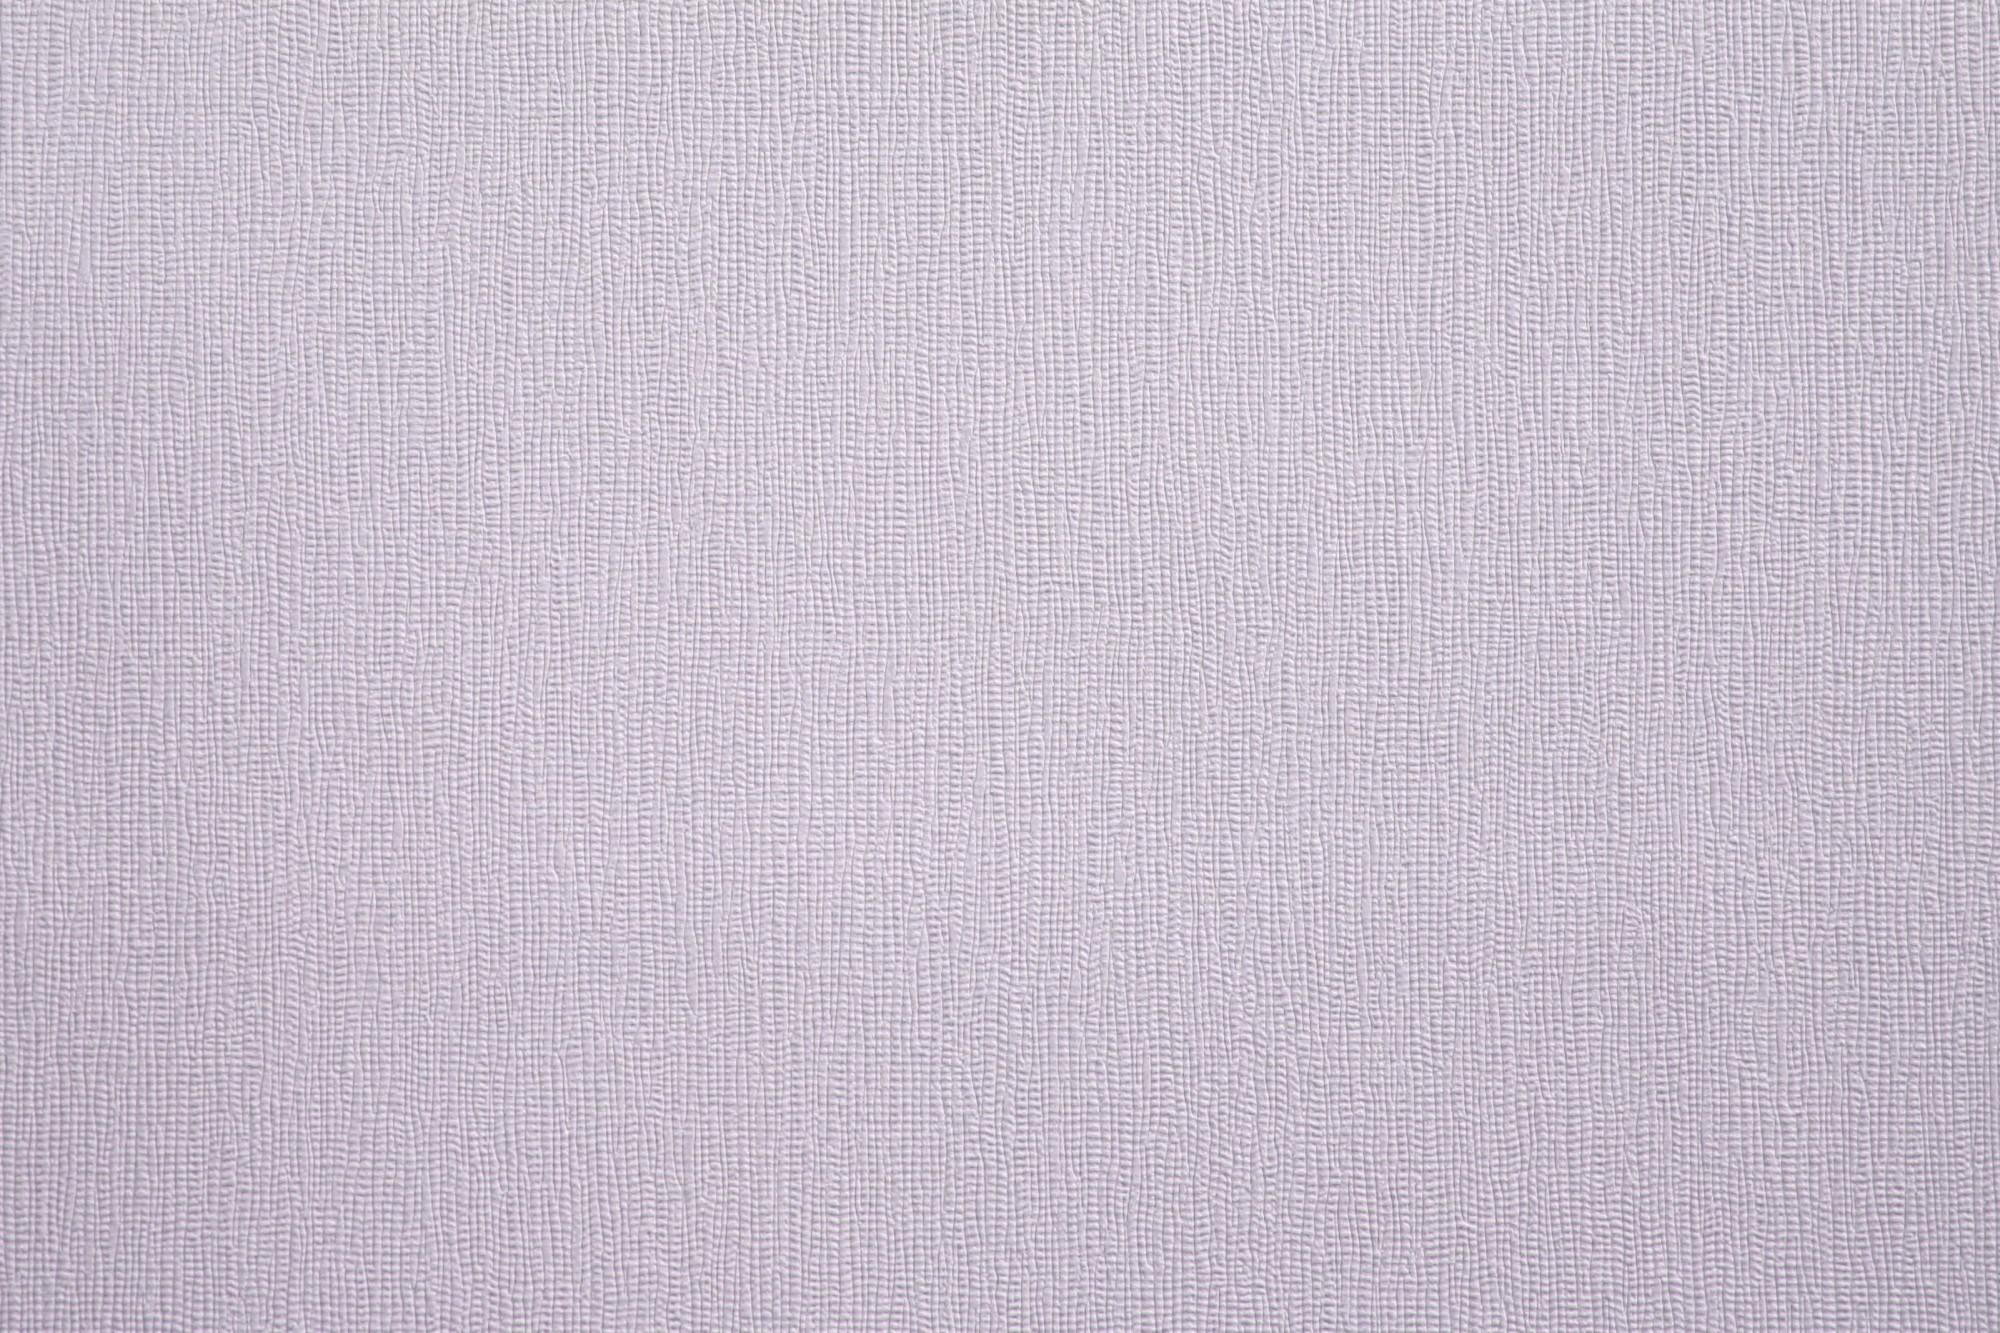 tapete rasch seduction 2014 vliestapete 796360 uni flieder 2 91 1qm ebay. Black Bedroom Furniture Sets. Home Design Ideas